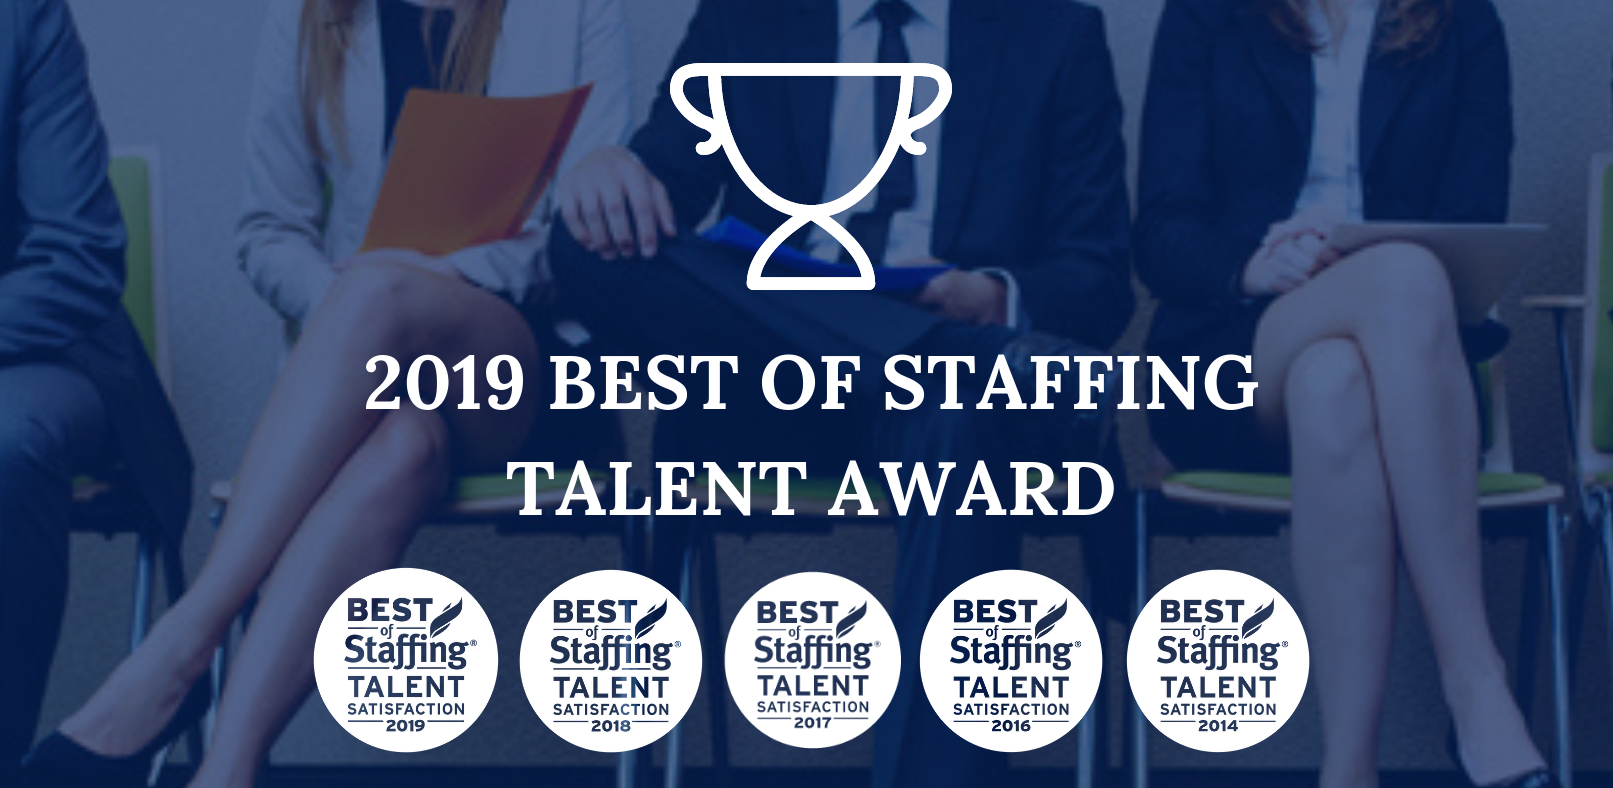 2019 Best of Staffing Talent Award Winner